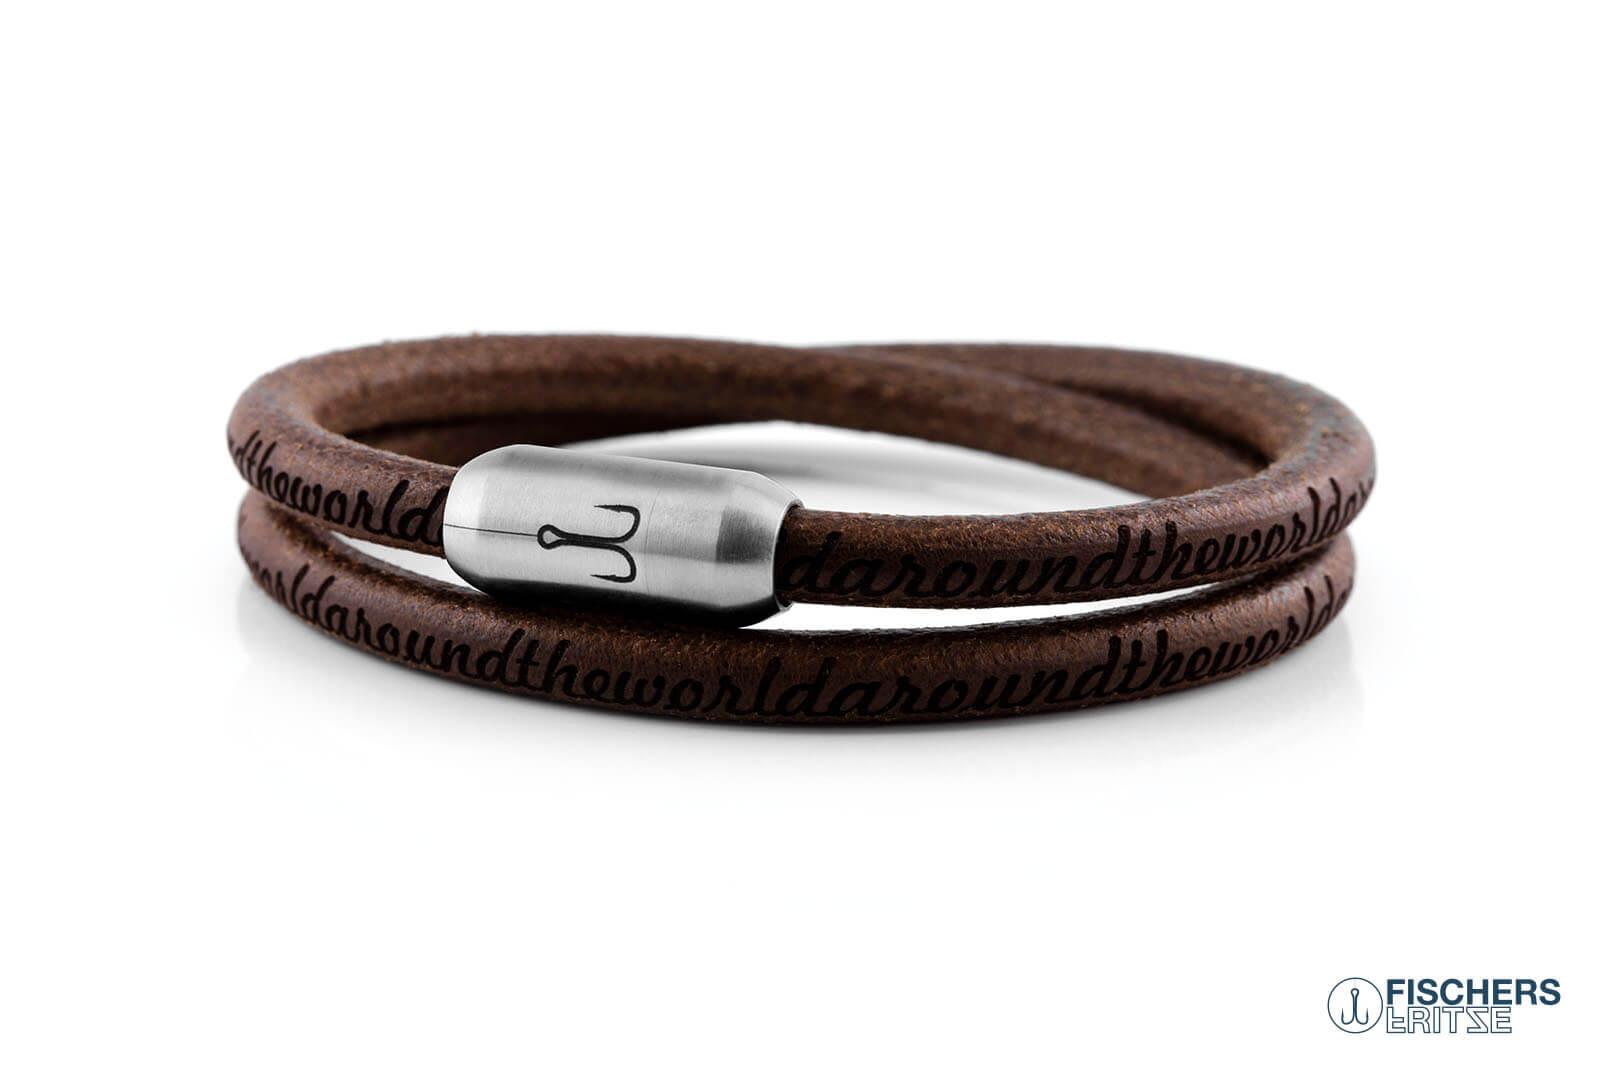 armband-fischers-fritze-garnele-aroundtheworld-leder